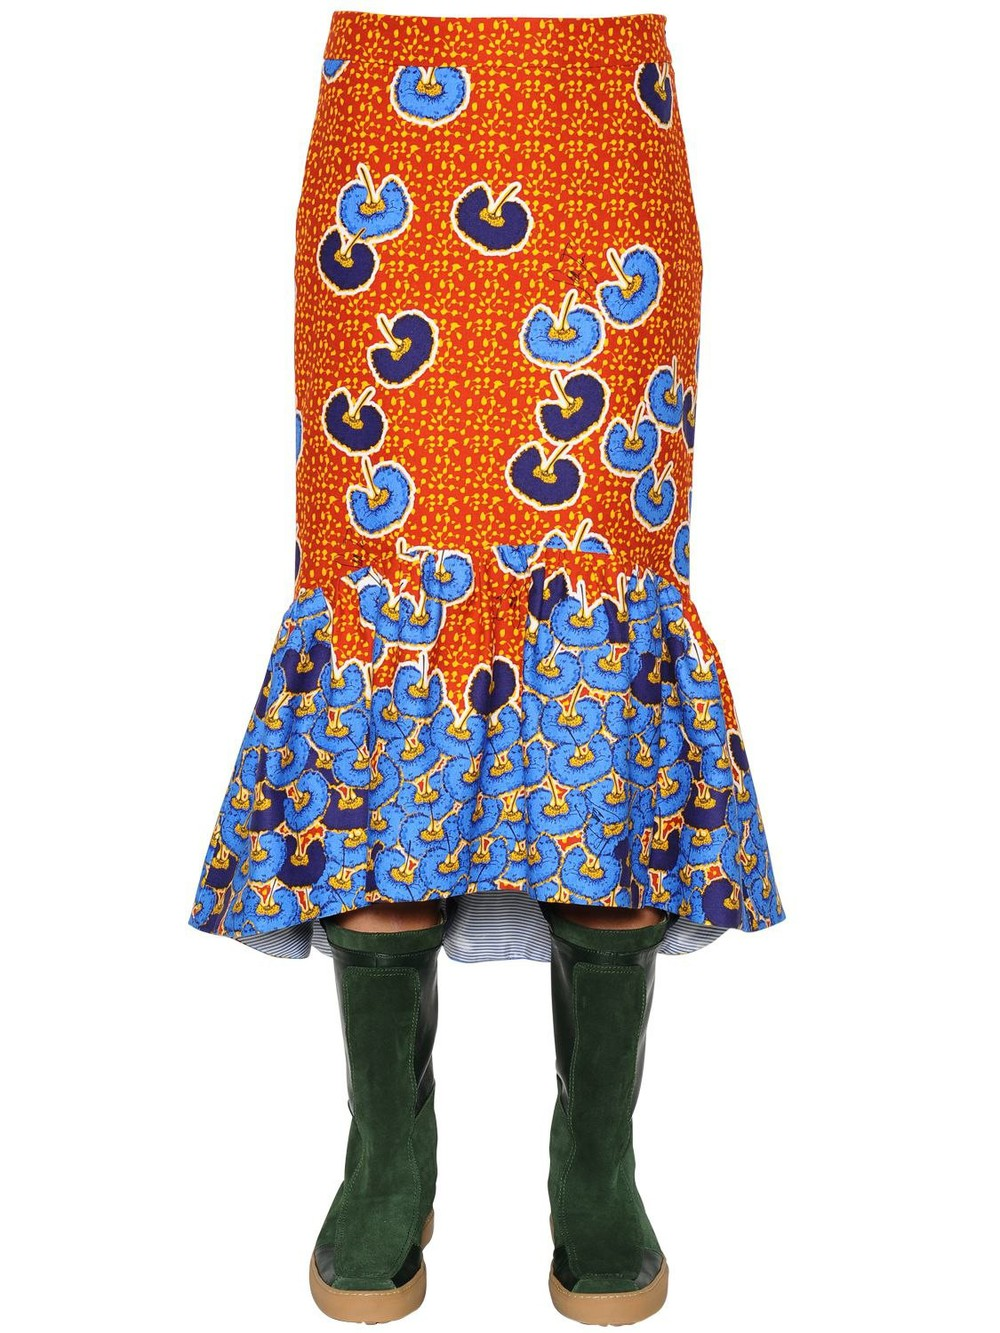 STELLA JEAN Ruffled Printed Cotton Twill Midi Skirt in blue / orange